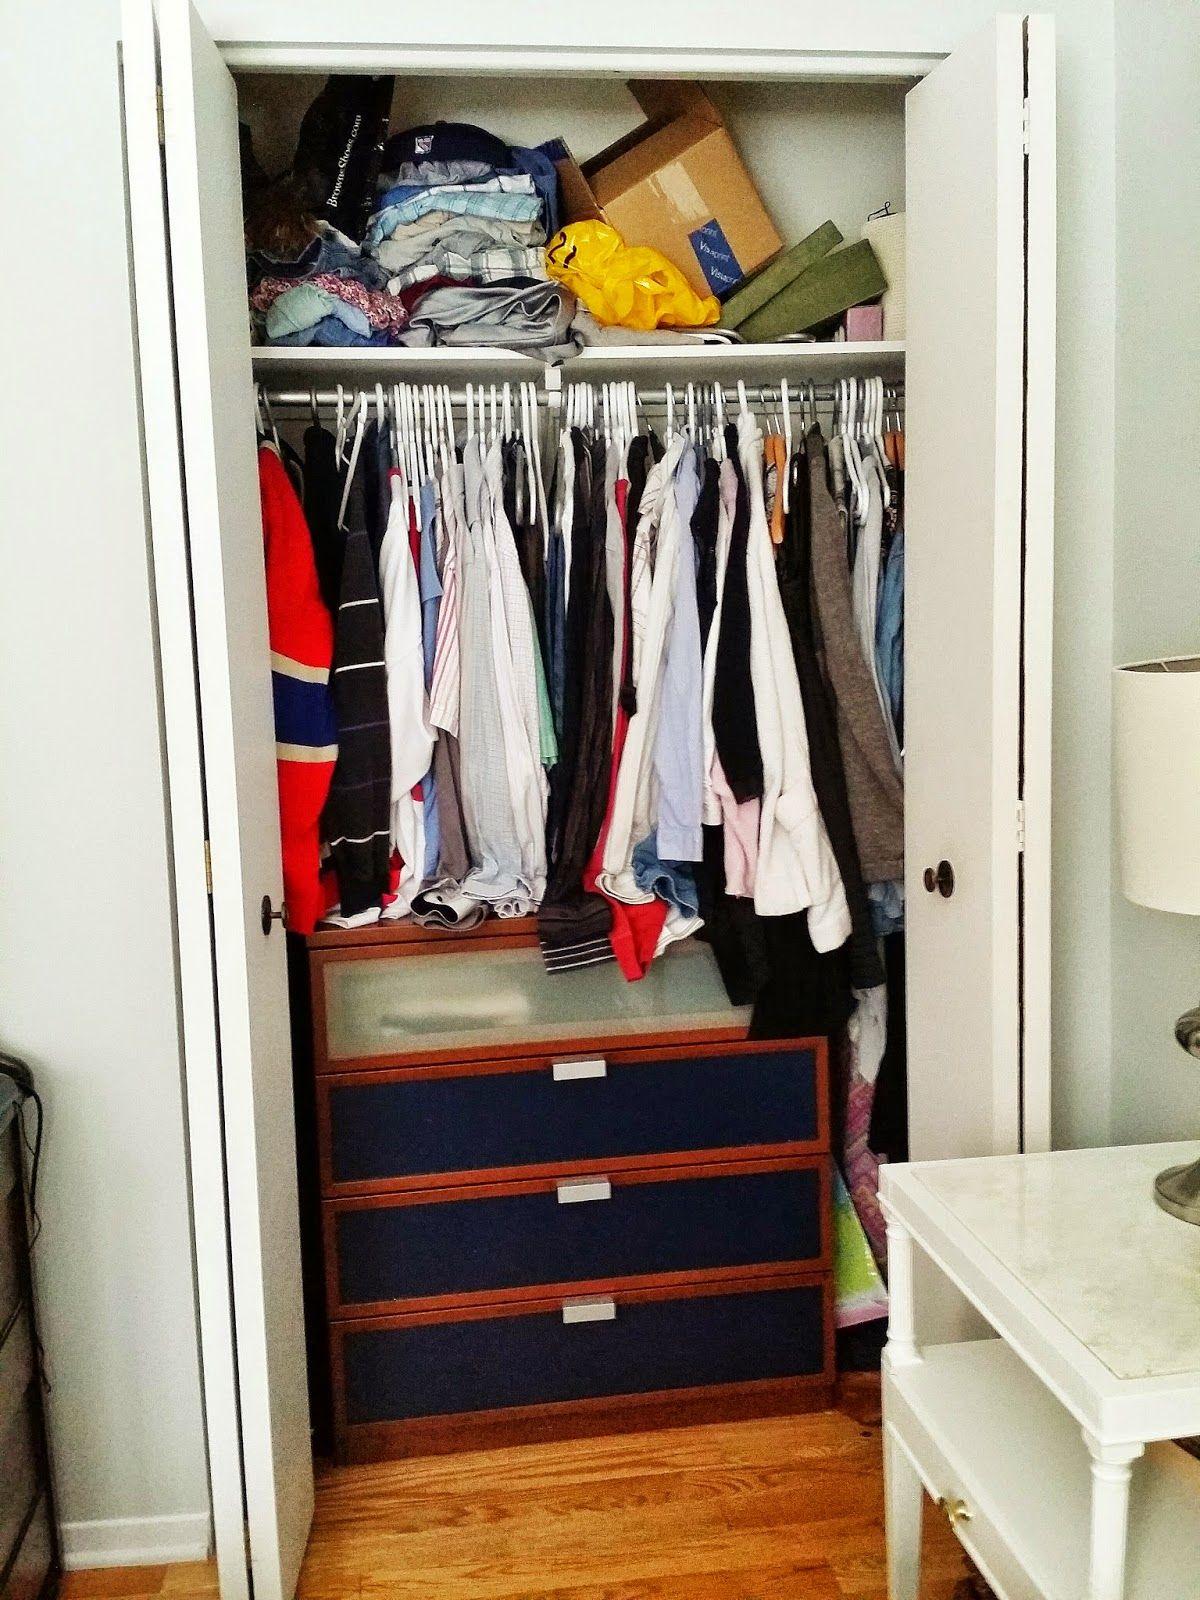 My perfectly organized closet system Ikea's Algot system